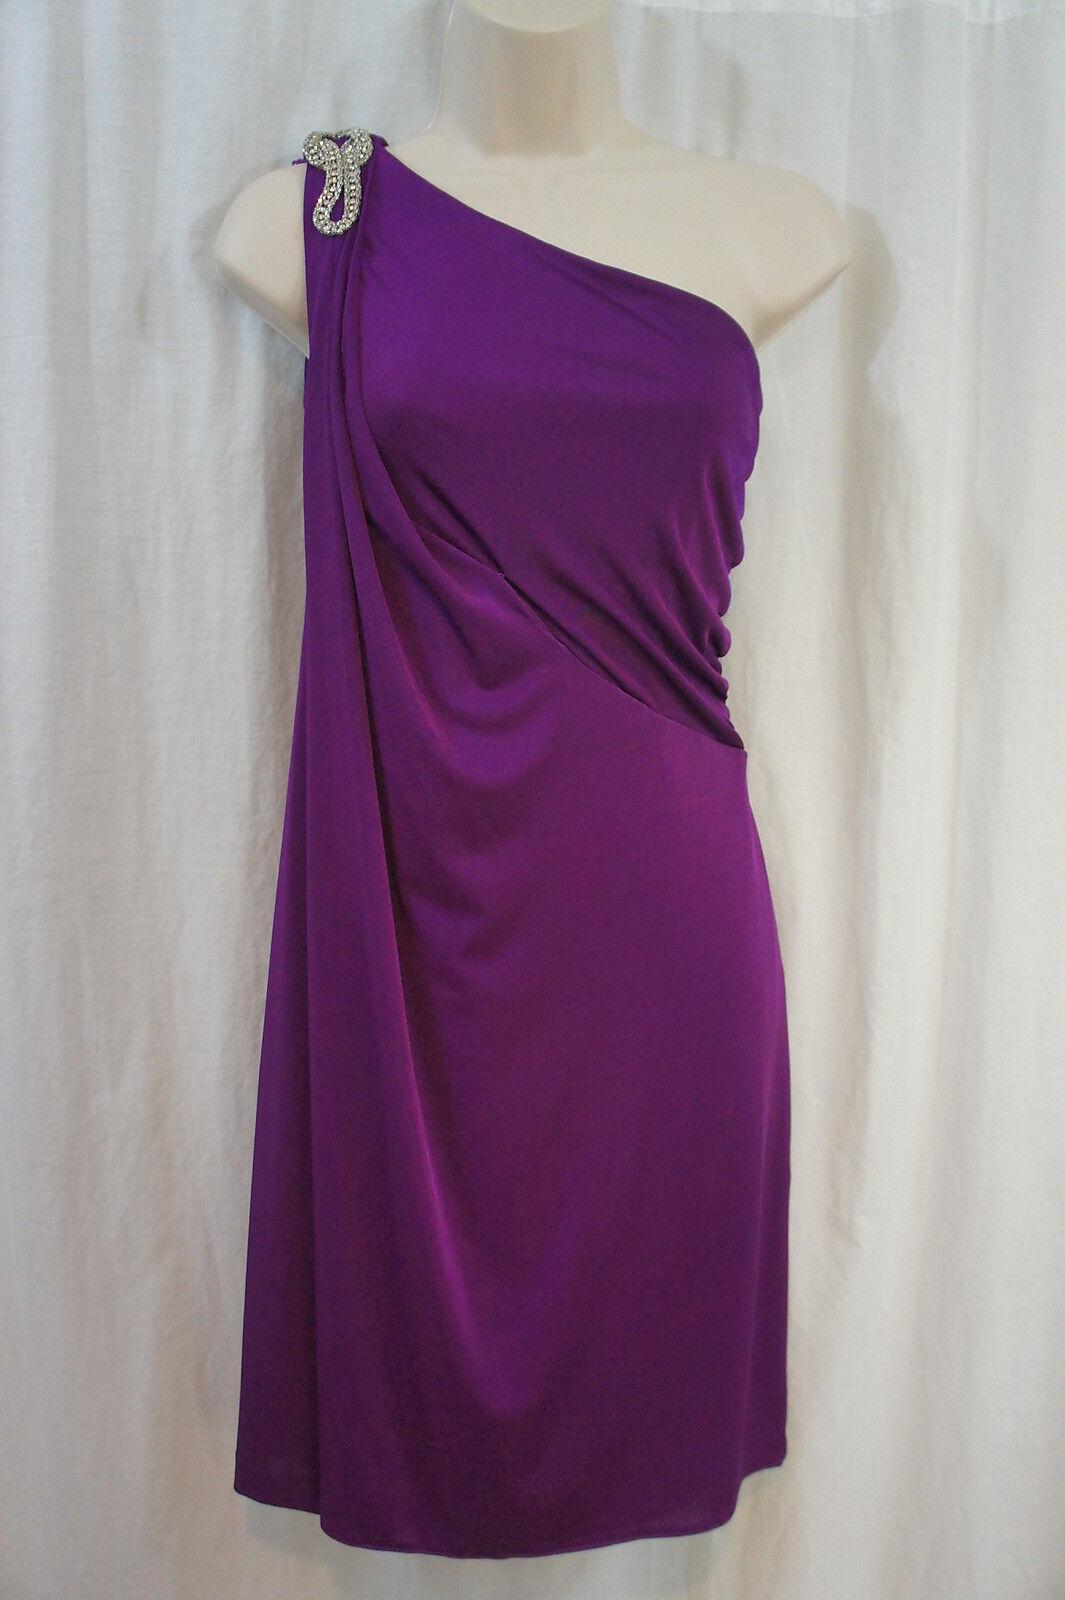 Patra Dress Ltd. Dress  Sz 10 Magena Ruched One Shoulder Evening Cocktail Dress